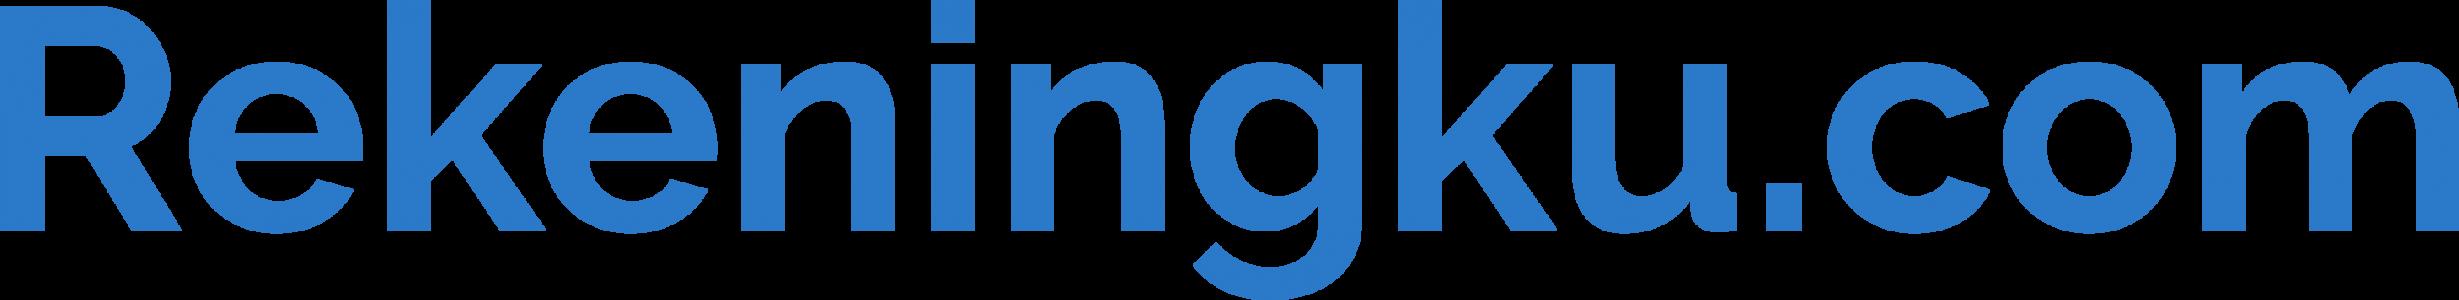 Final_Logo_Rekeningku1-02